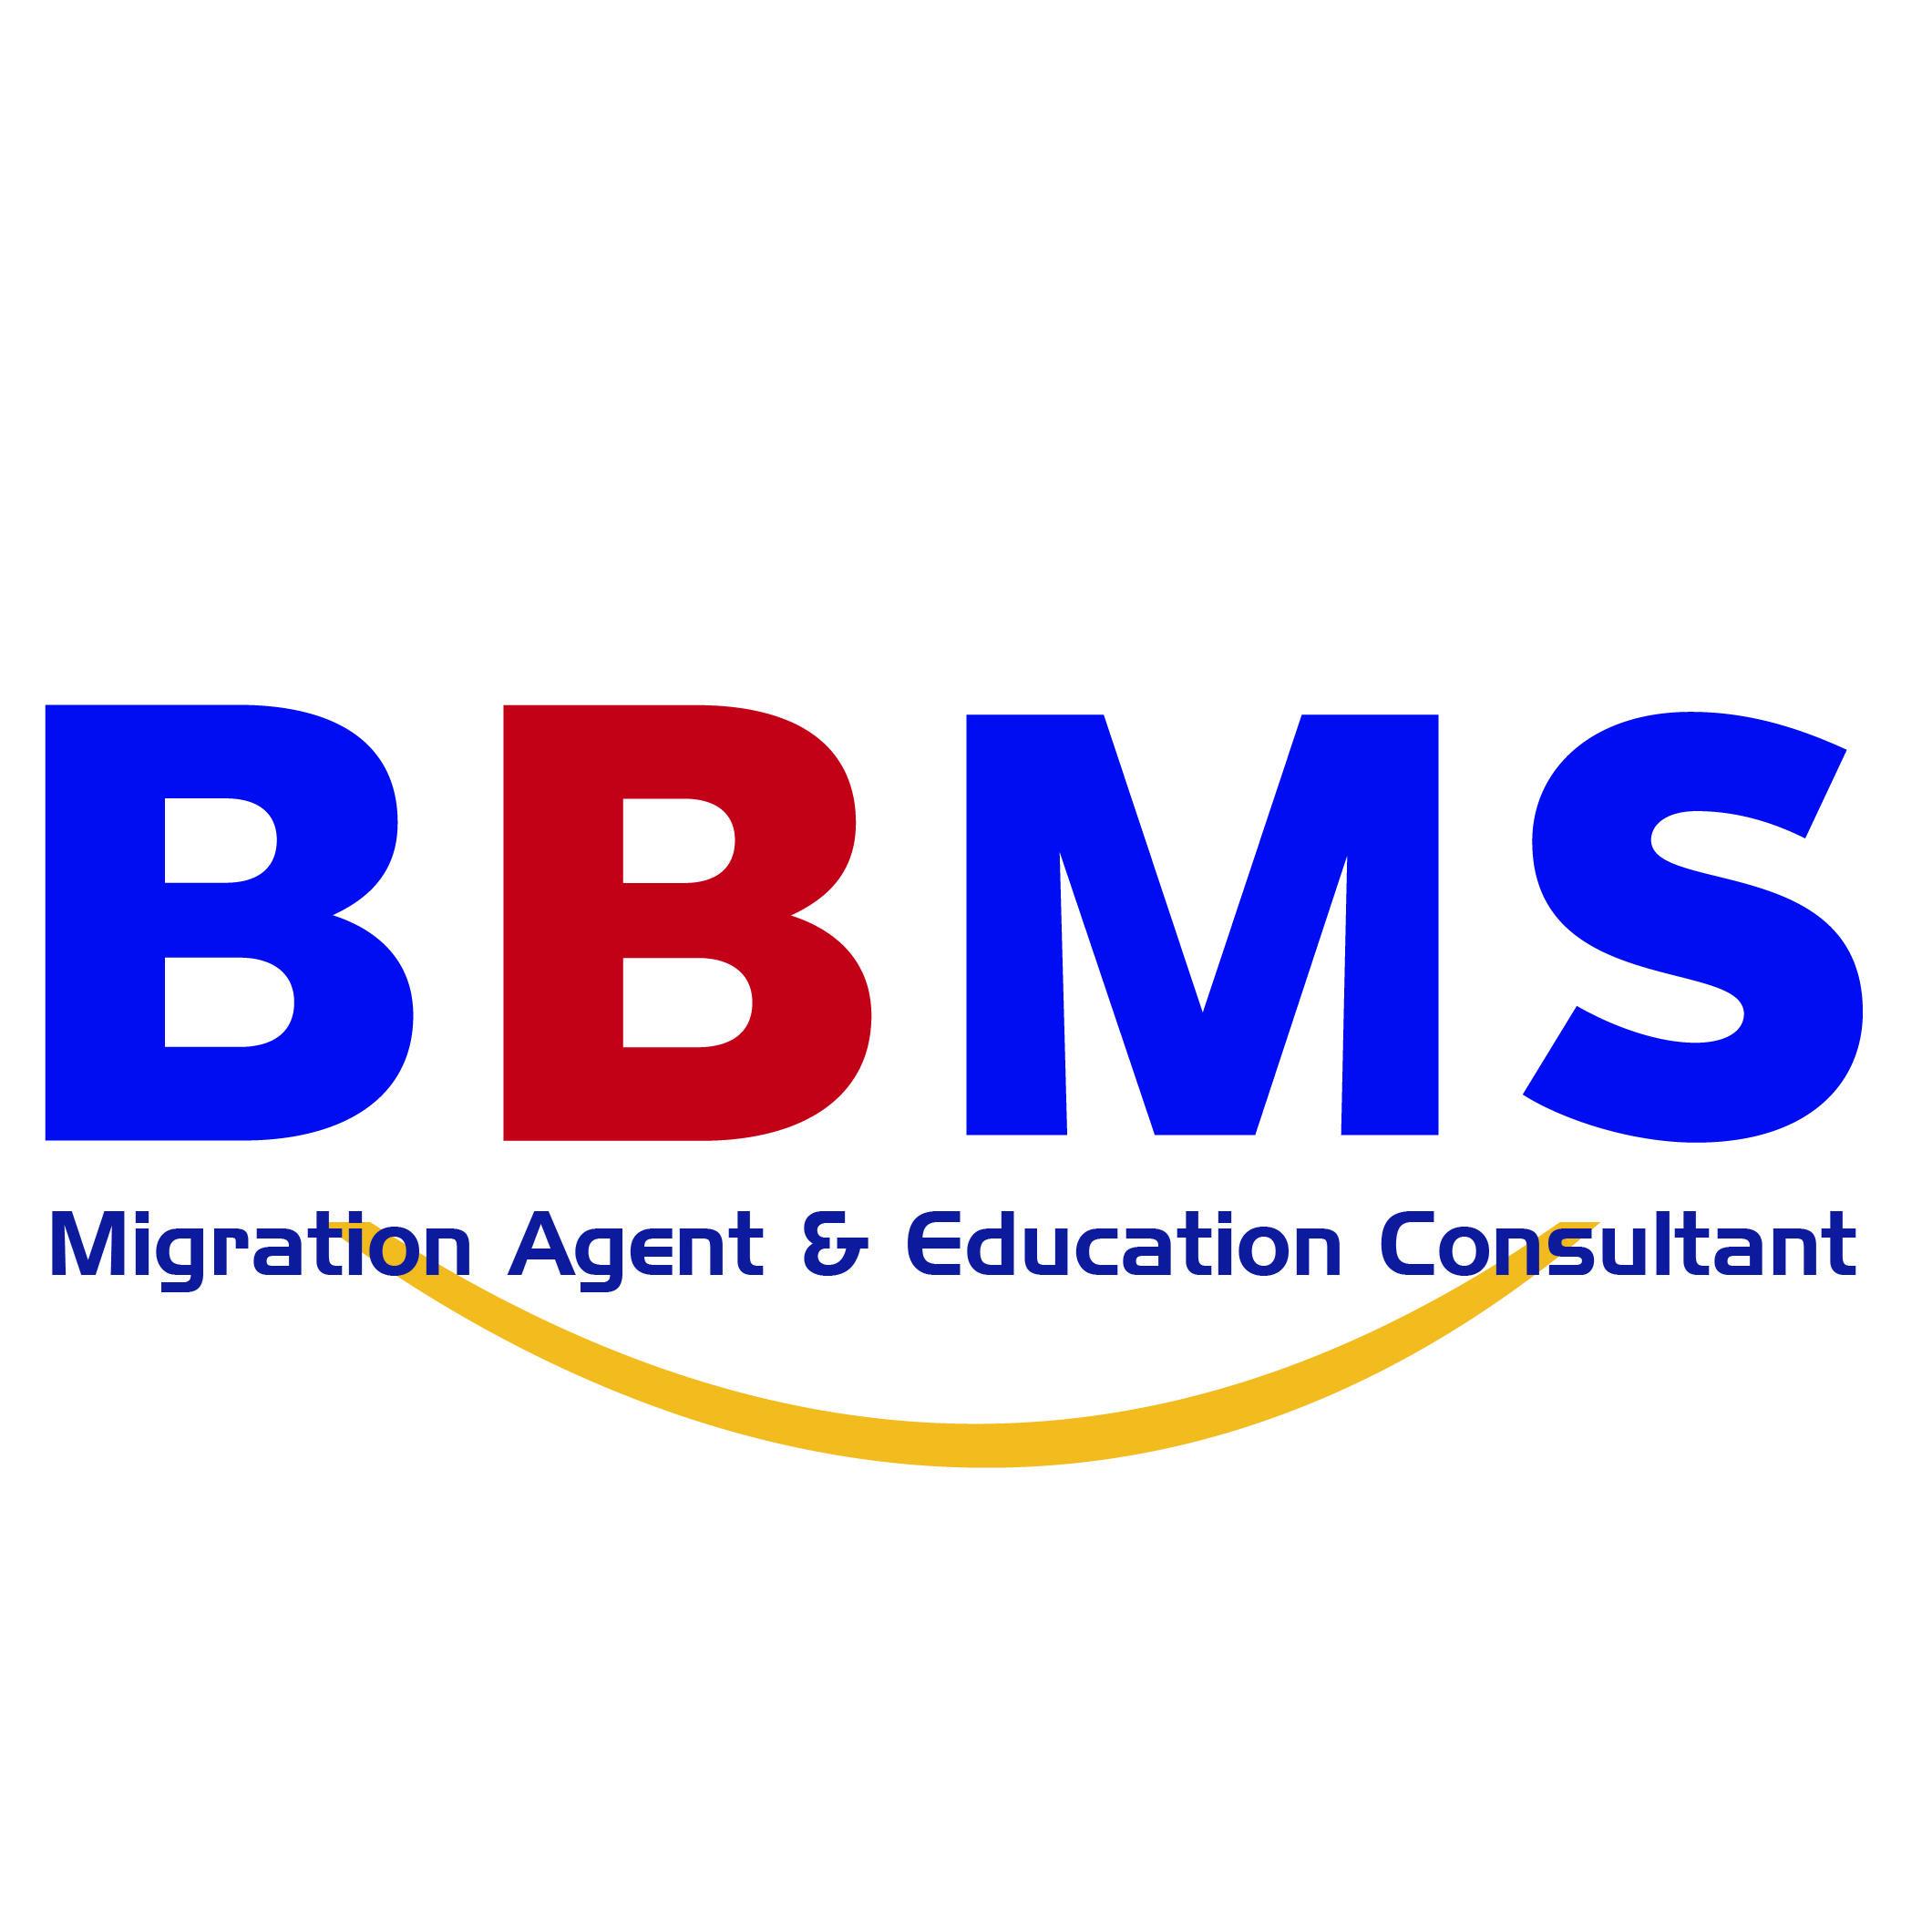 BBMS Recruitment International Pty Ltd